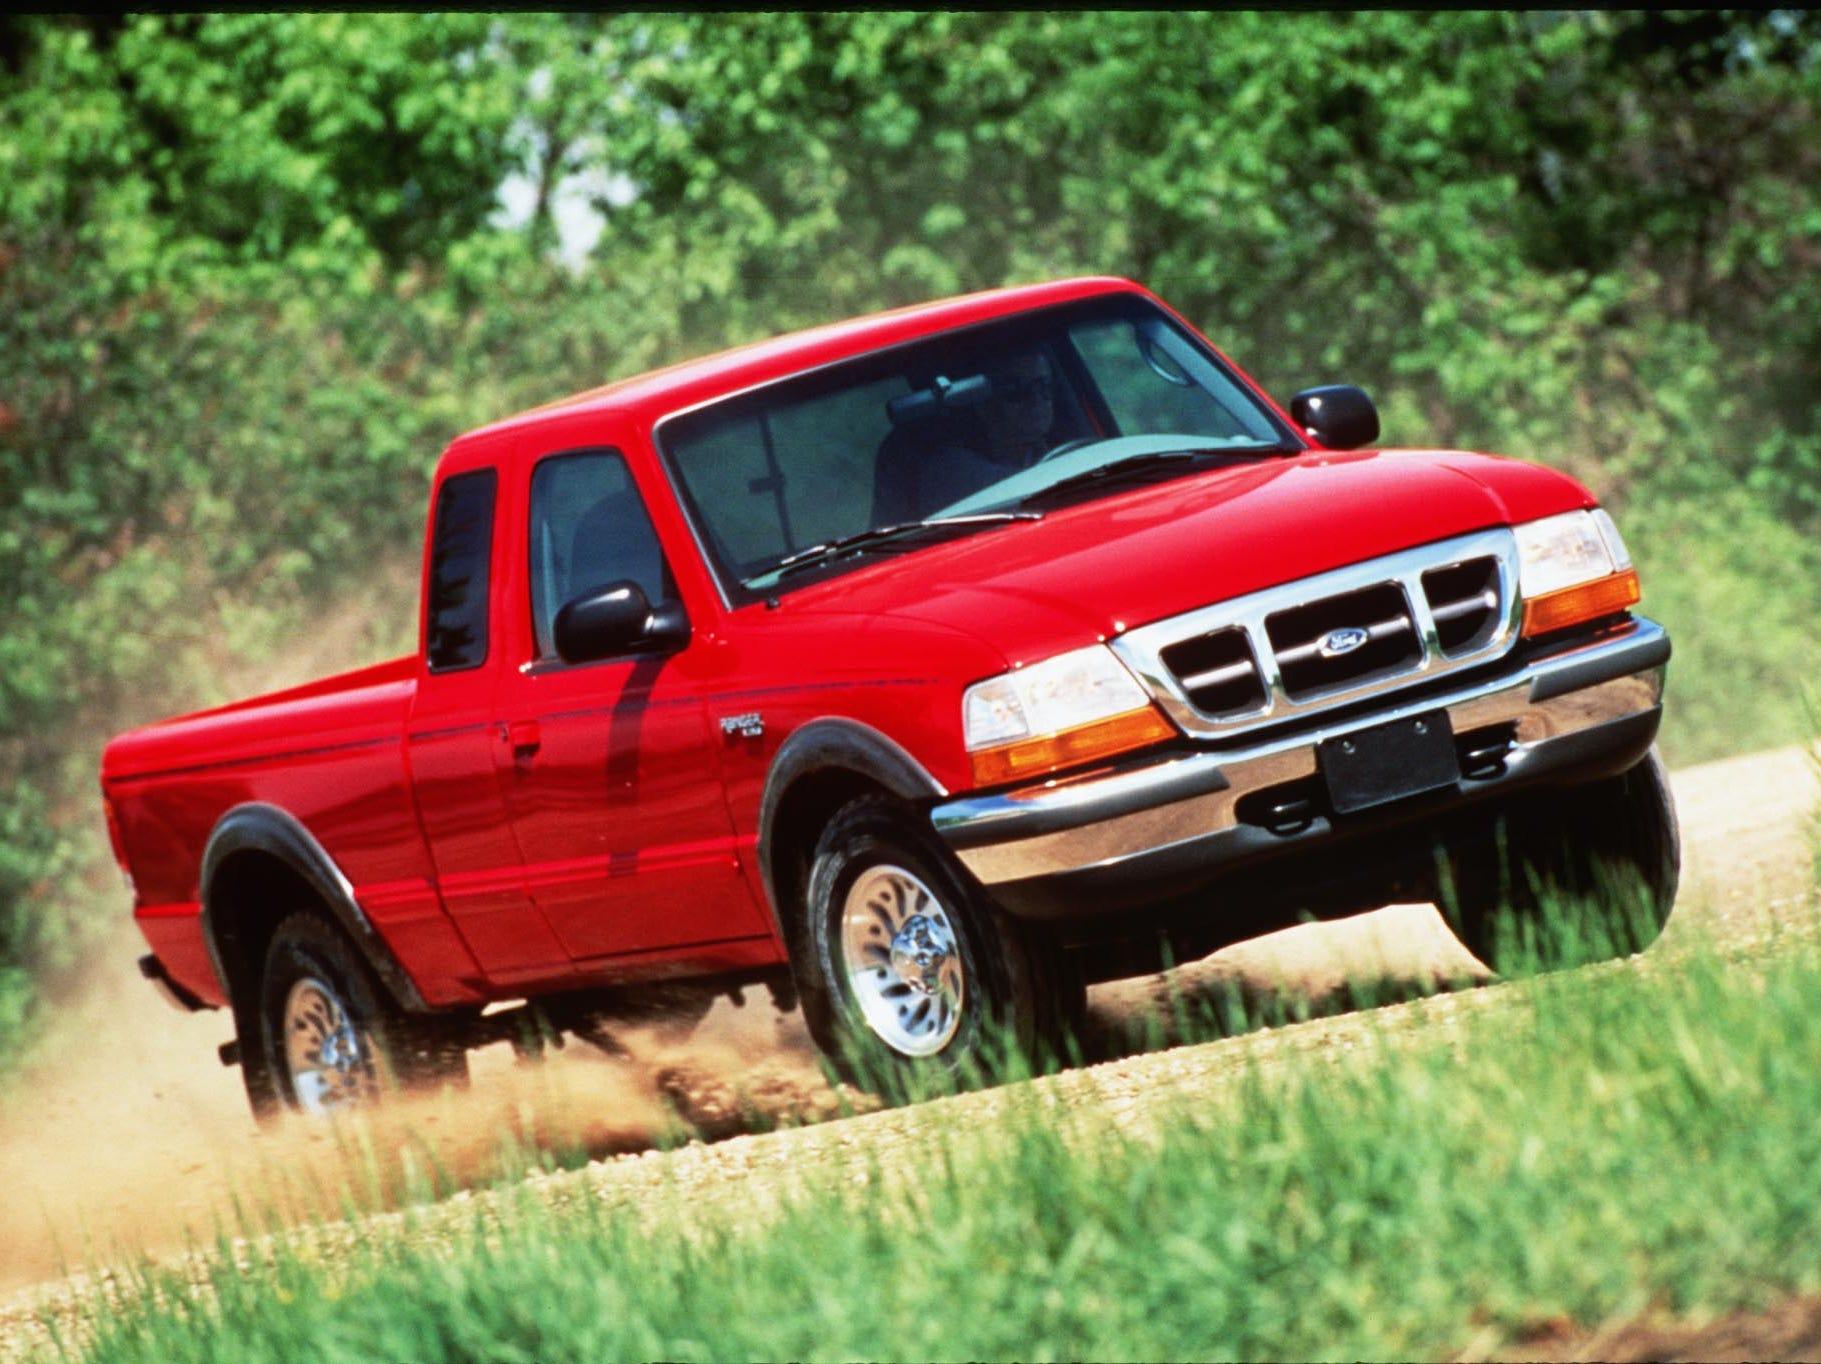 A 1998 Ford Ranger XLT 4X4.